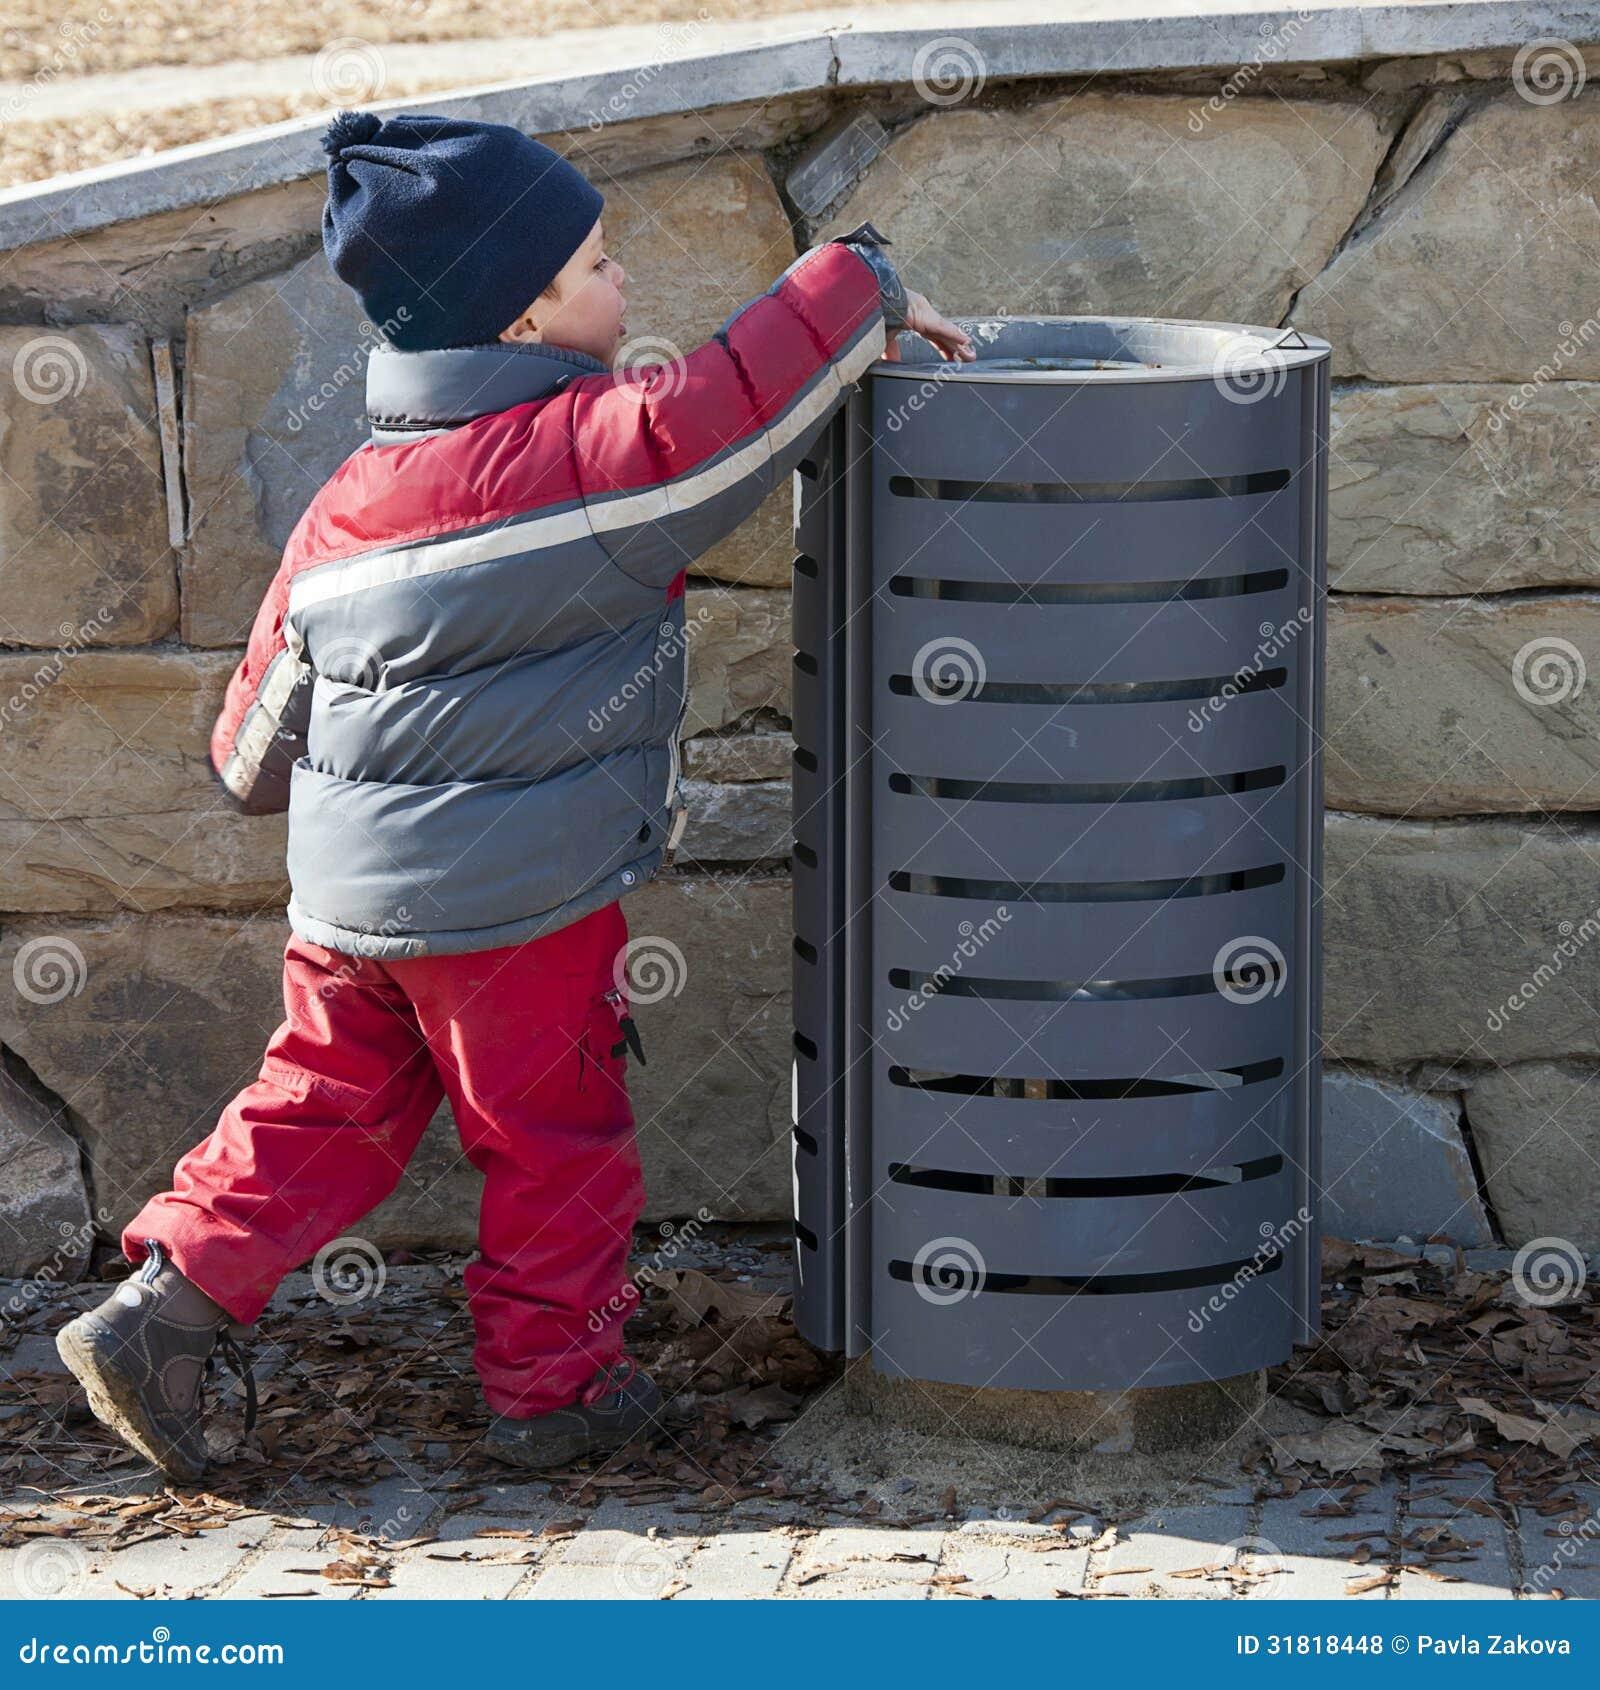 Child At Rubbish Bin Royalty Free Stock Photos Image